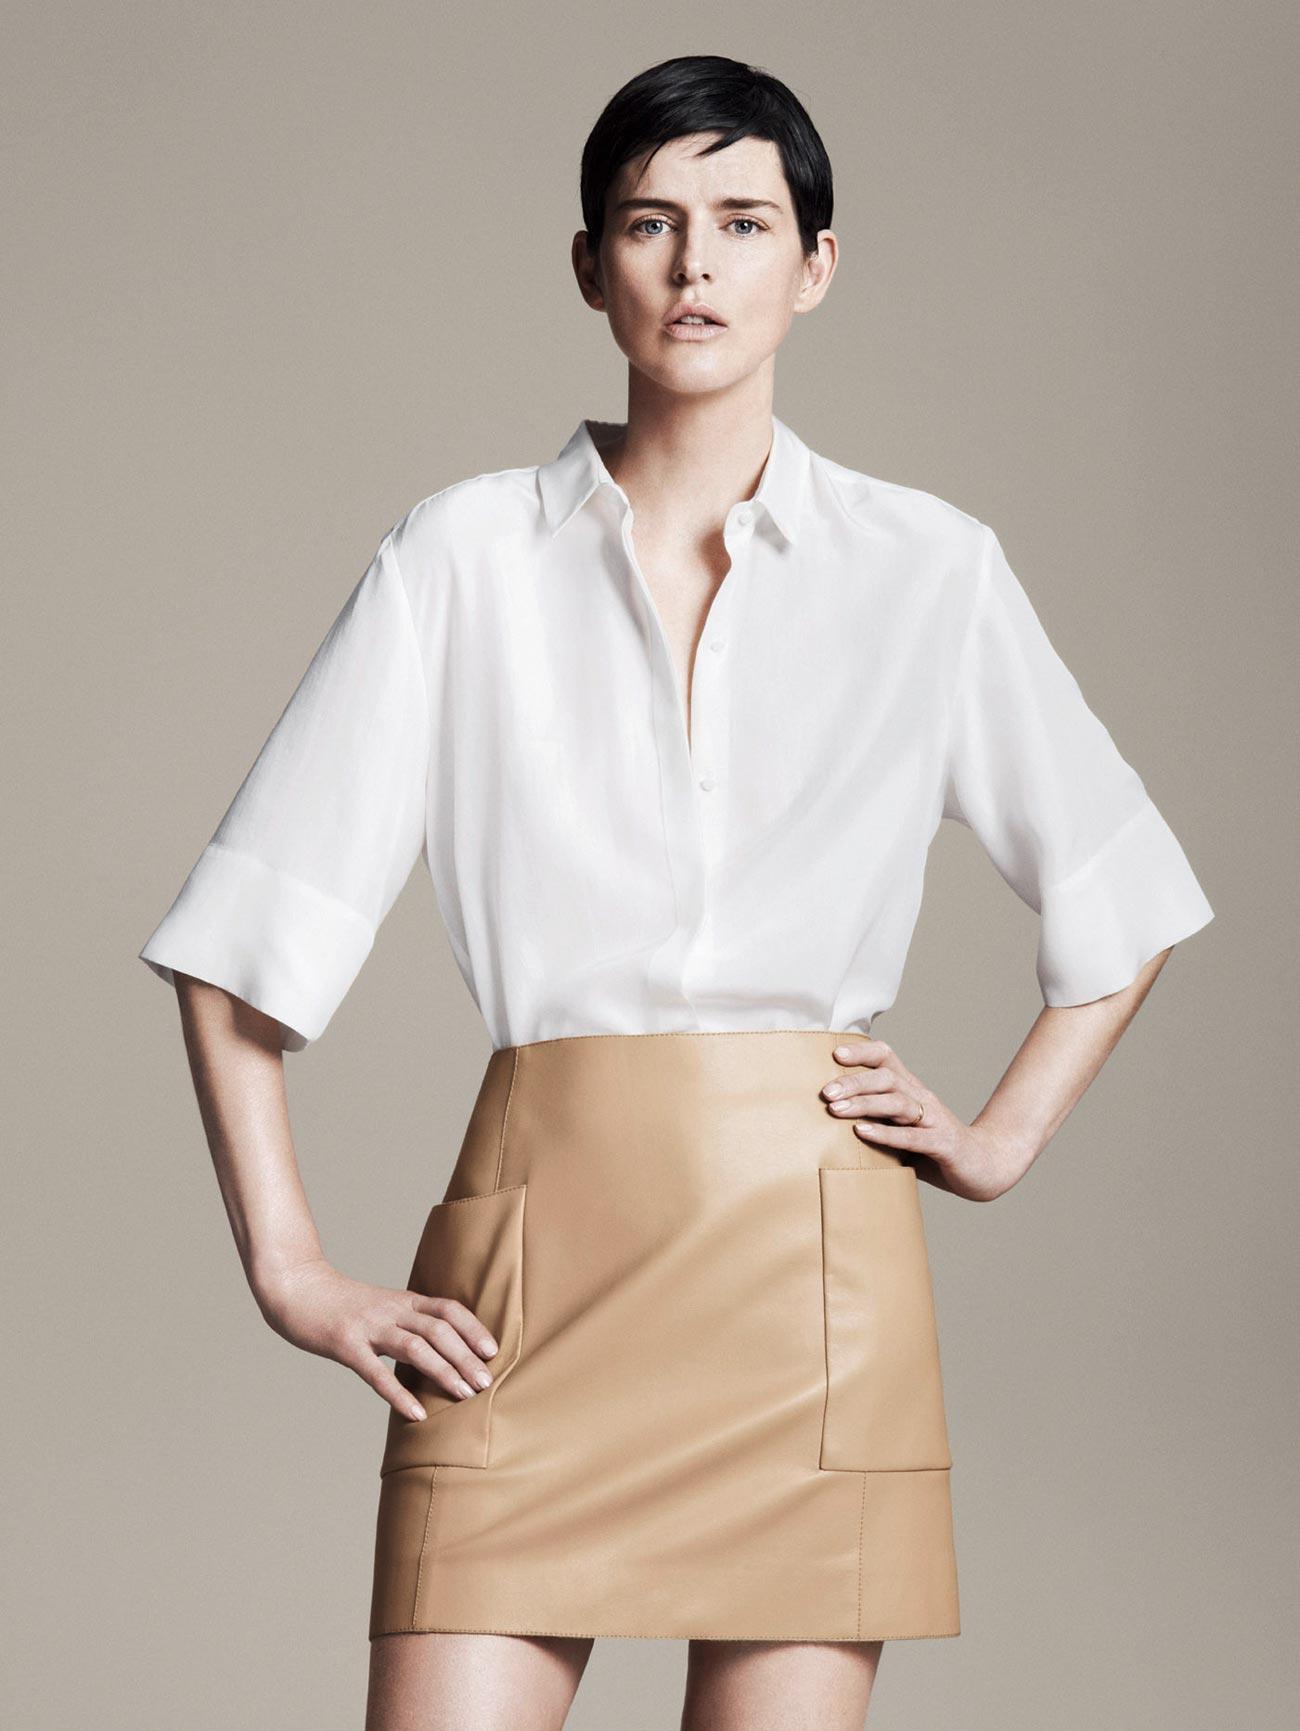 Stella Tennant For Zara Spring Summer 2011